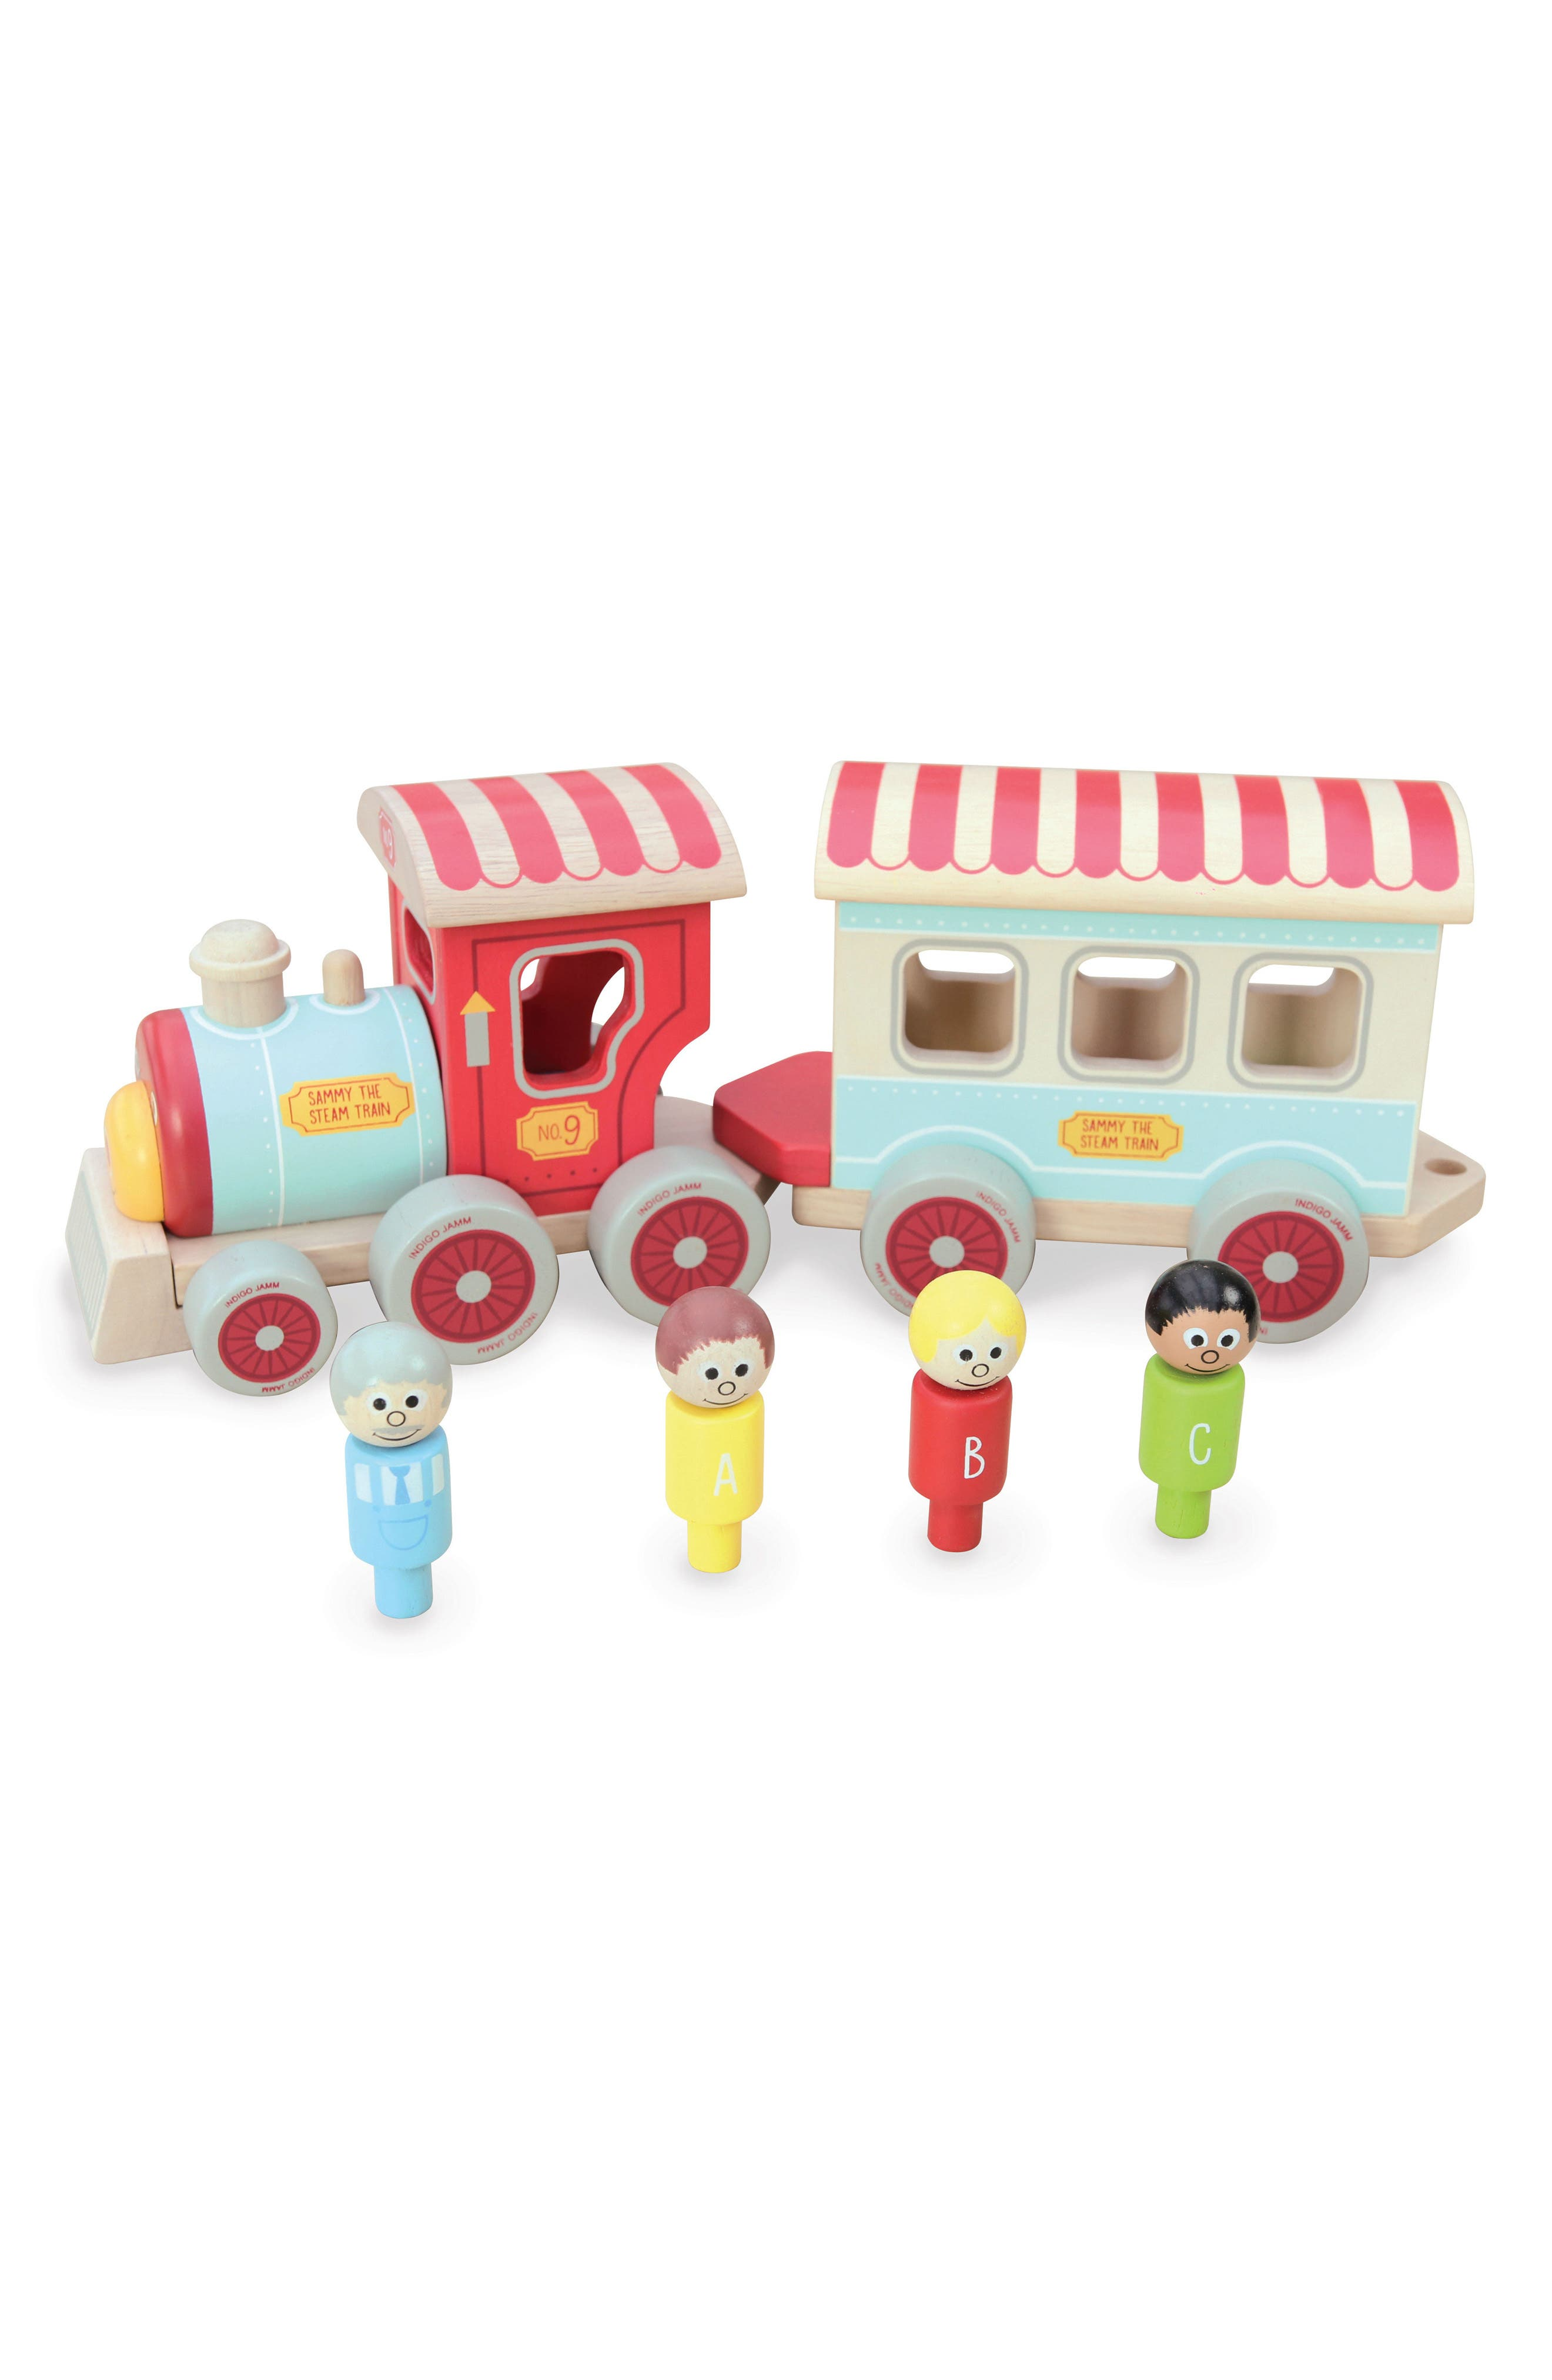 Alternate Image 1 Selected - Indigo Jamm Wooden Train Toy